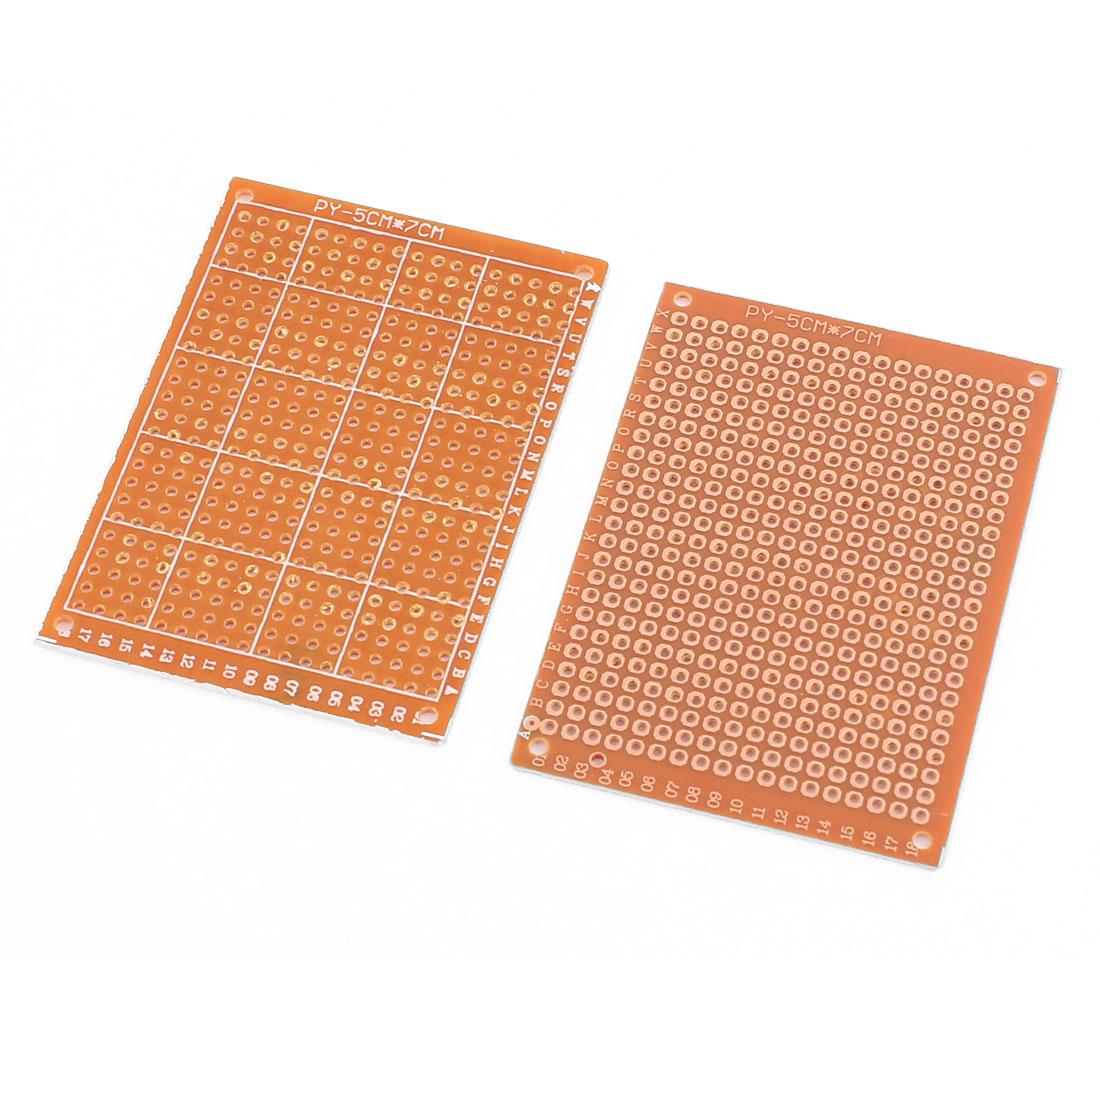 2Pcs 5x7cm Prototype Single Side PCB Universal Experiment Matrix Circuit Board